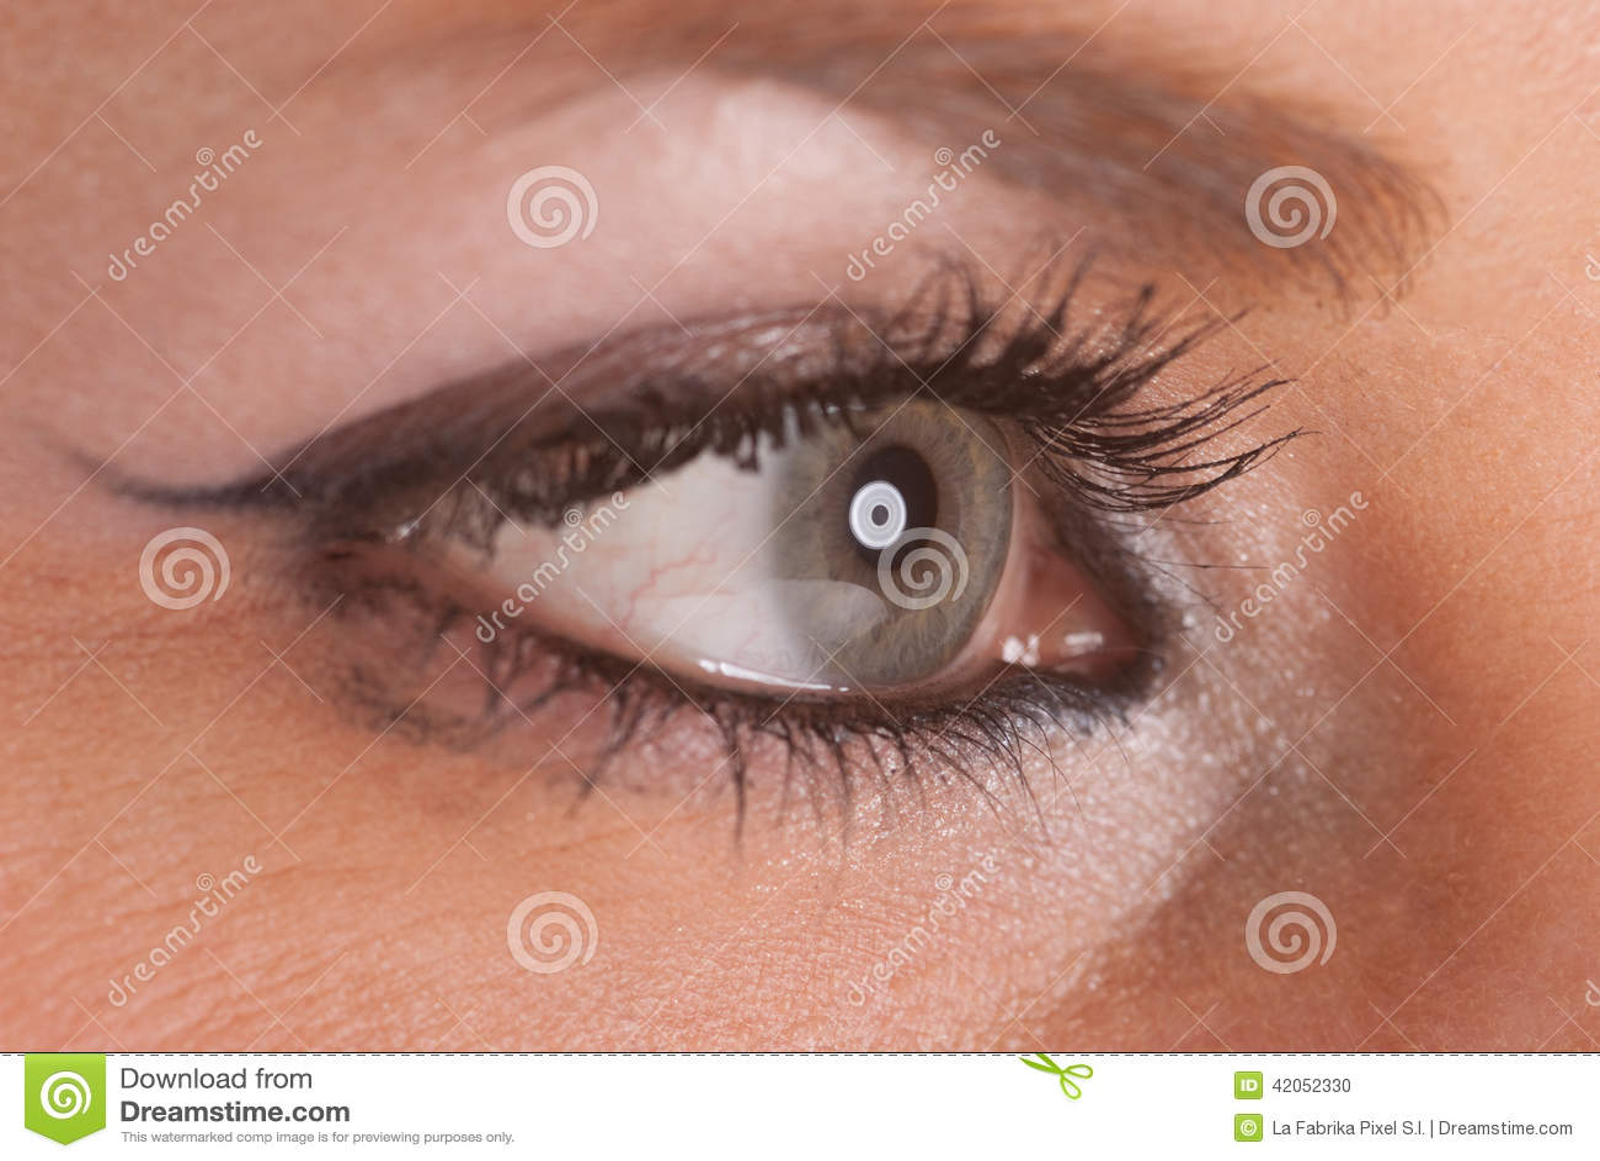 ojo en perfil foto de archivo imagen de rimel  joven eyeball vector free eyeball vector outline